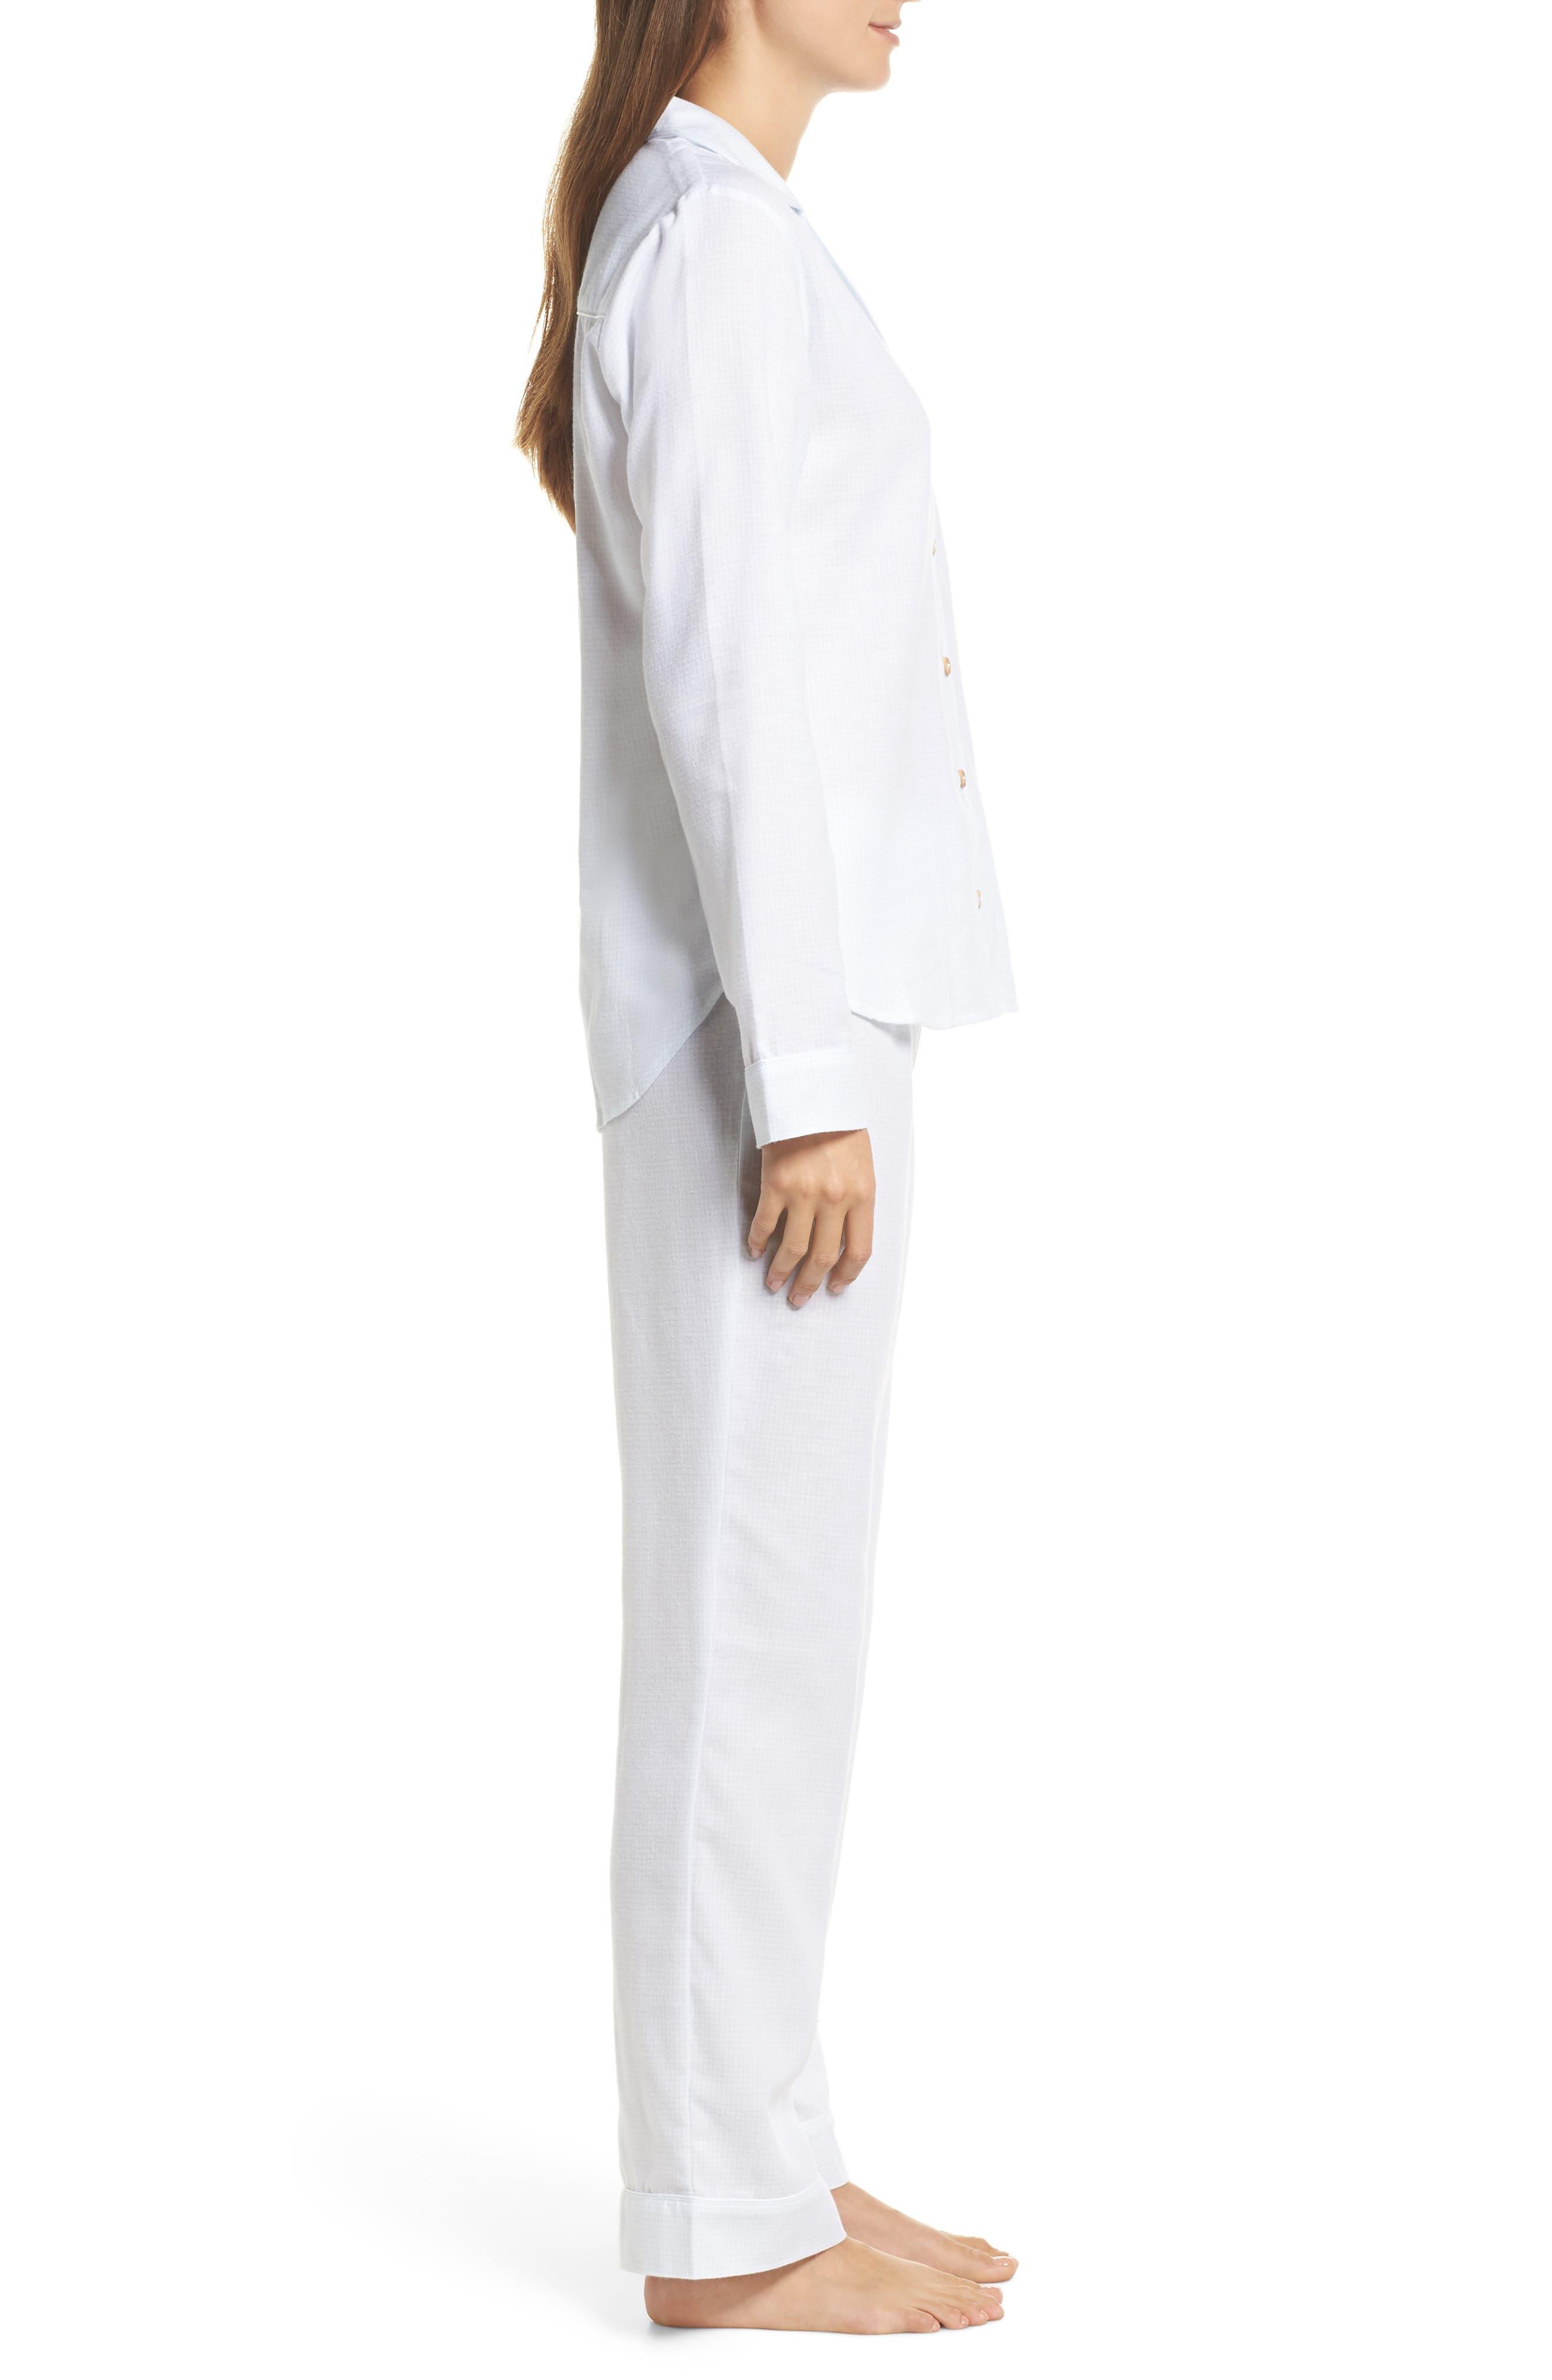 Raven Plaid Pajamas,                             Alternate thumbnail 3, color,                             WHITE / SKY BLUE CHECK